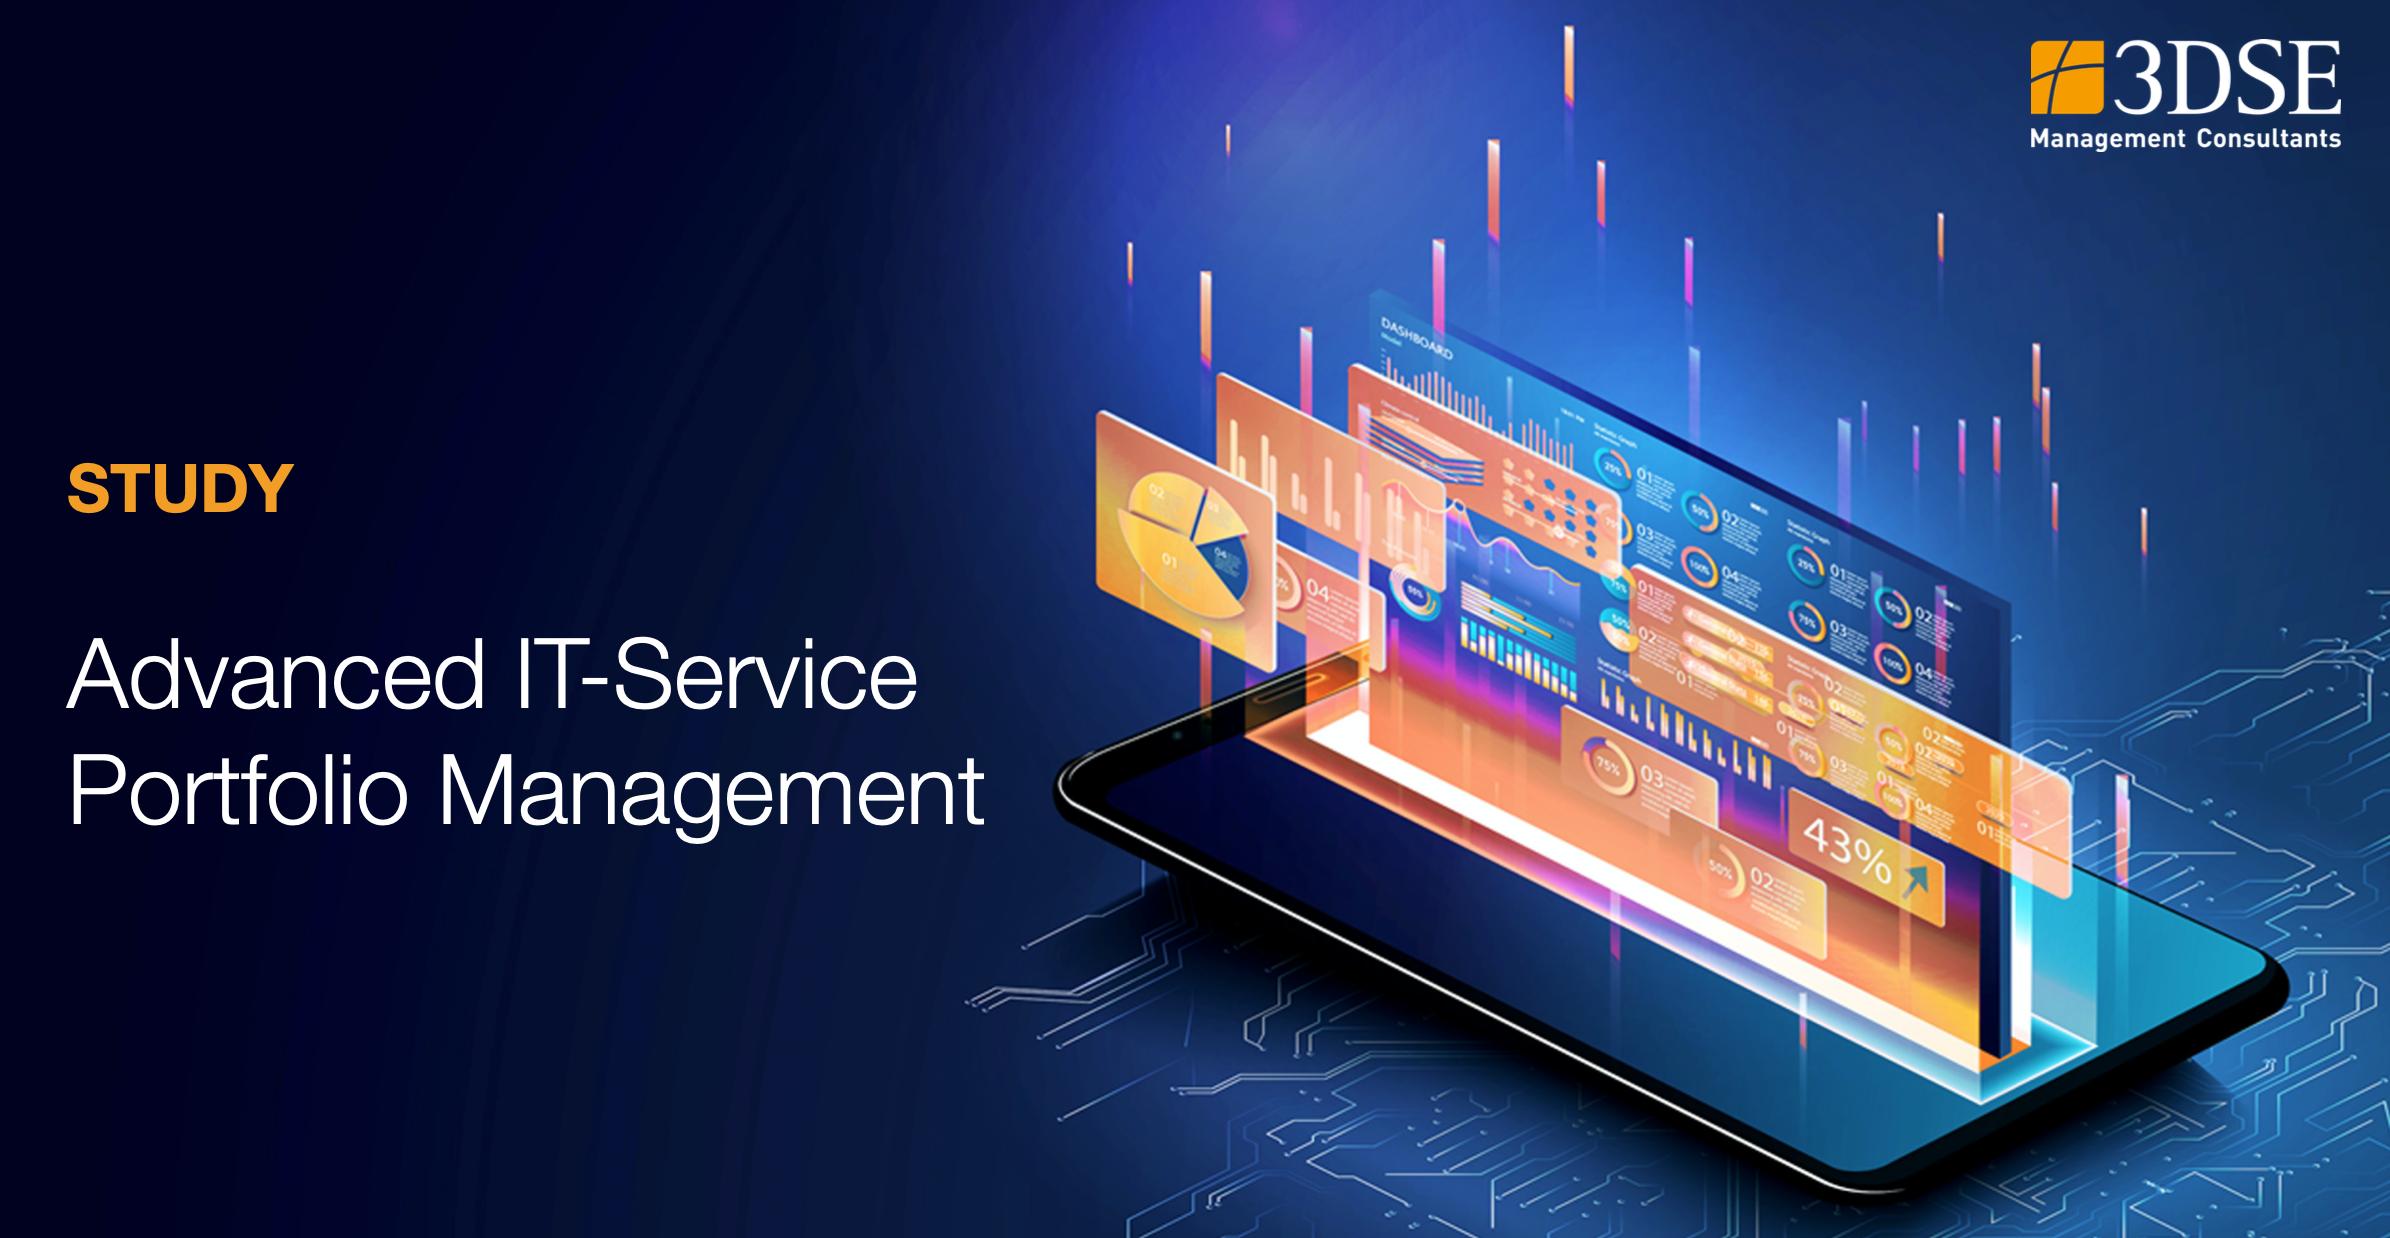 Advanced IT-Service Portfolio Management